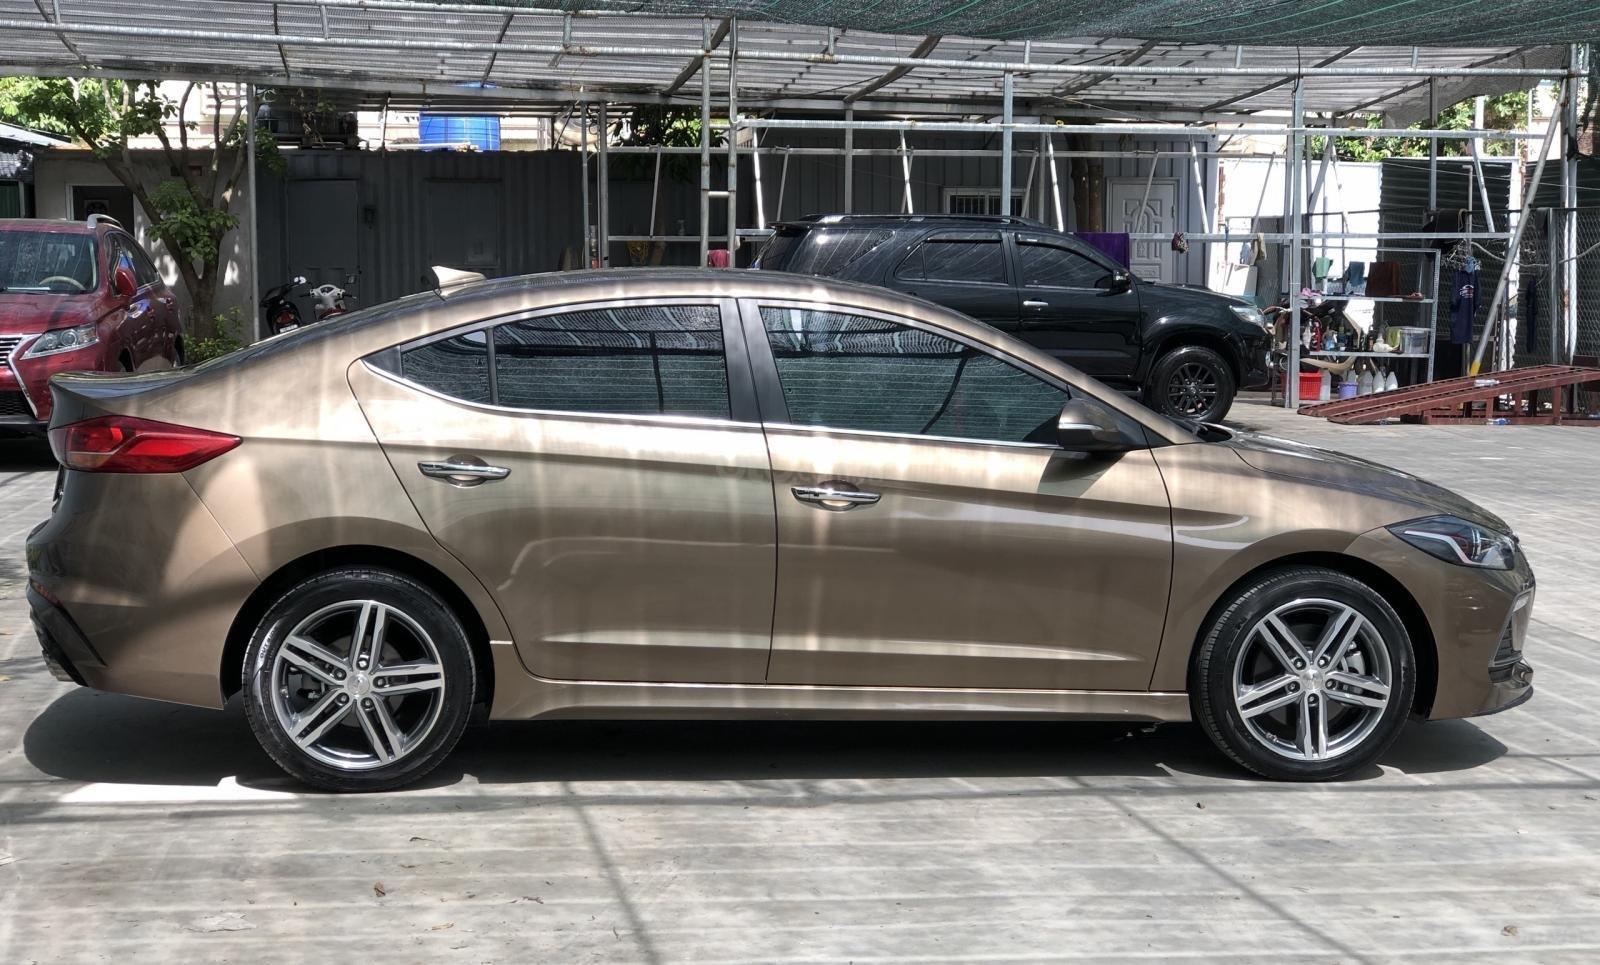 Cần bán Hyundai Elantra Tubor Sport 1.6 AT năm 2018, màu nâu (2)